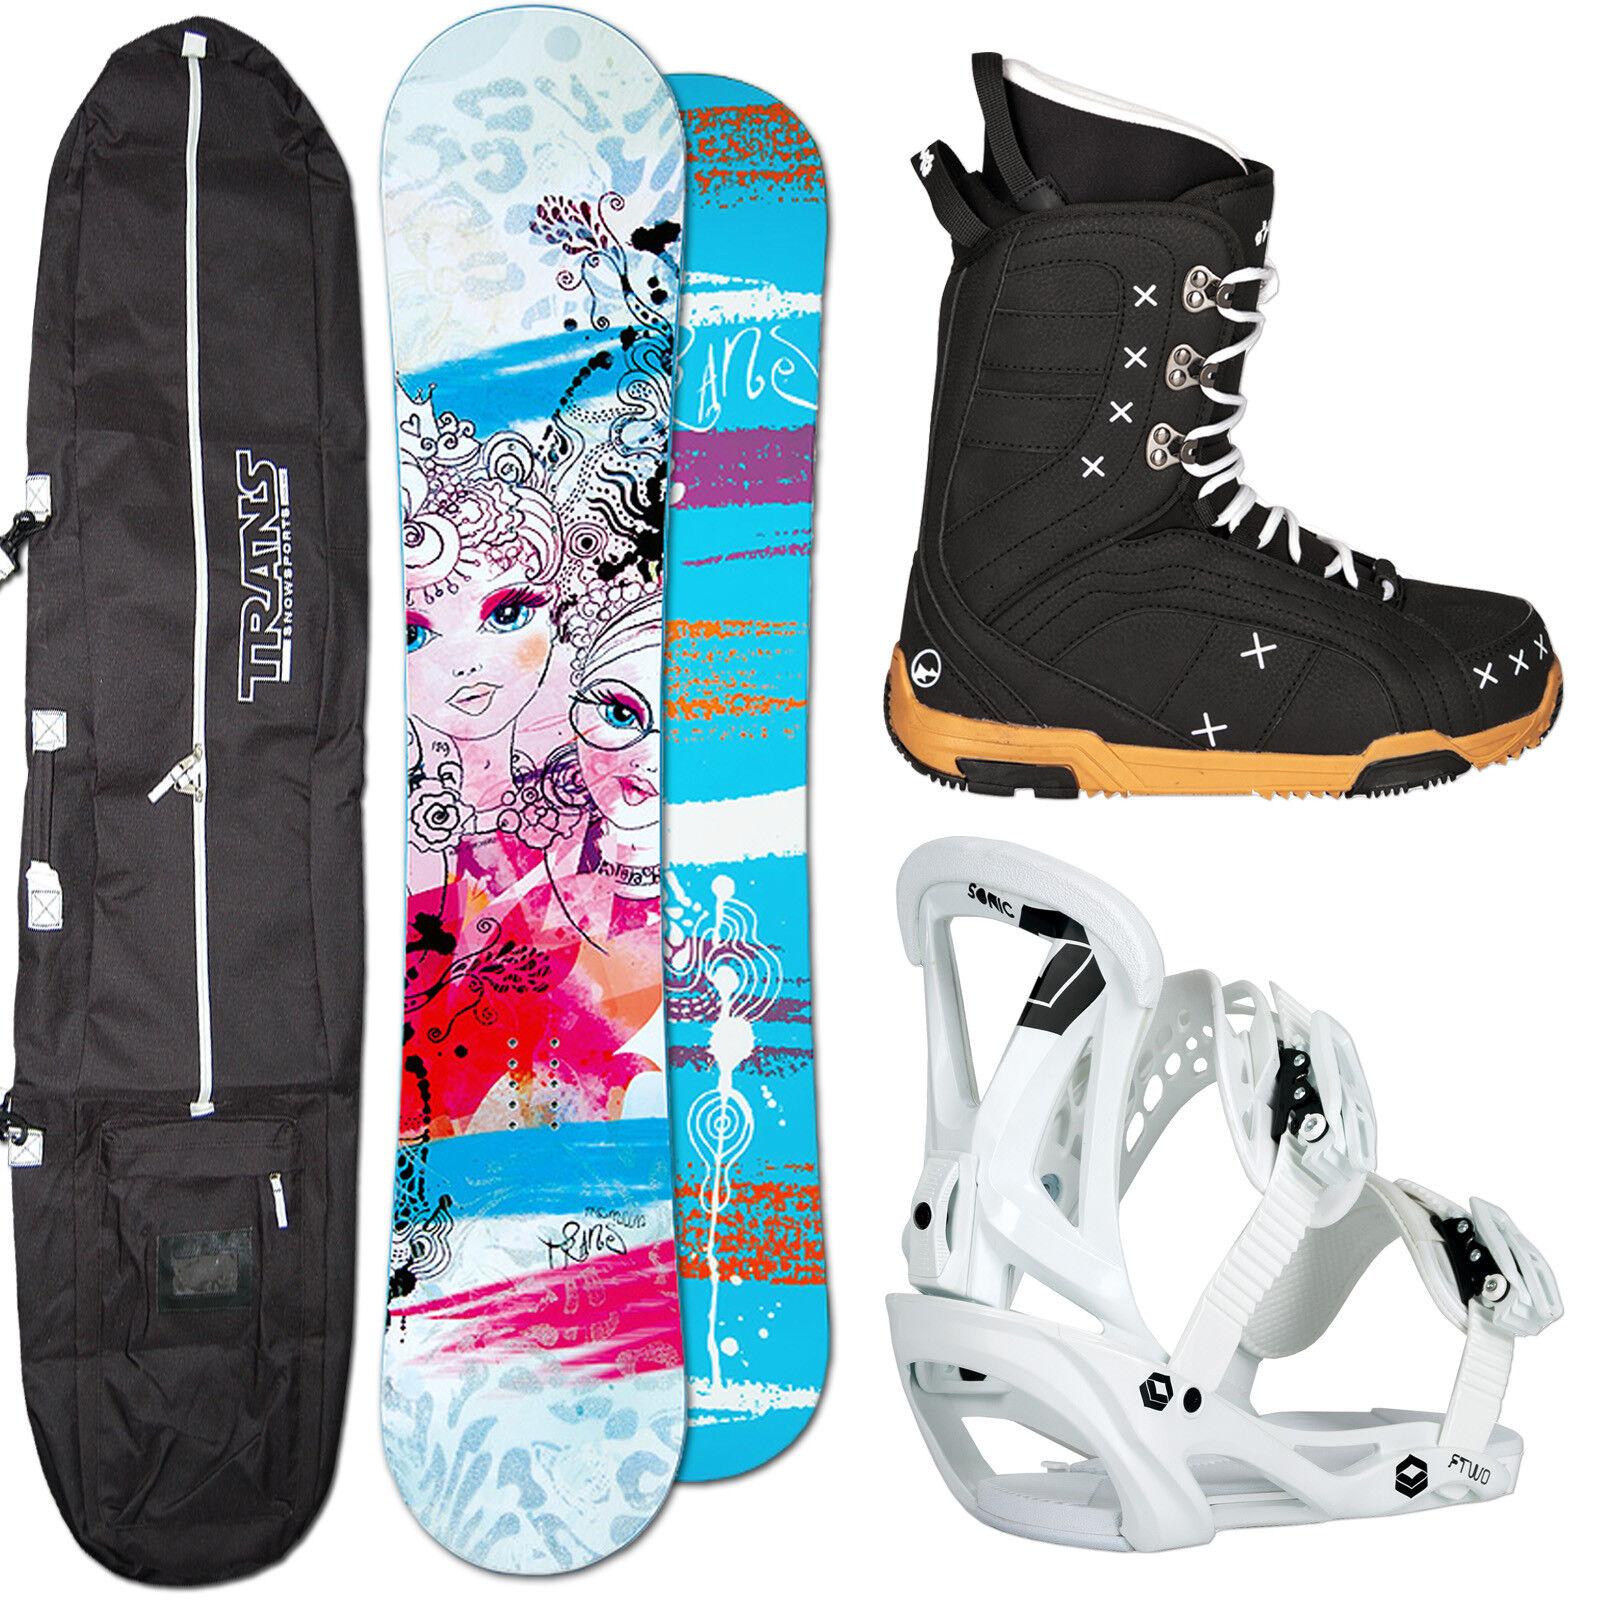 Snowboard Mujer Set Trans Premium 143cm + Ftwo Sonic Fijación Talla M + botas +